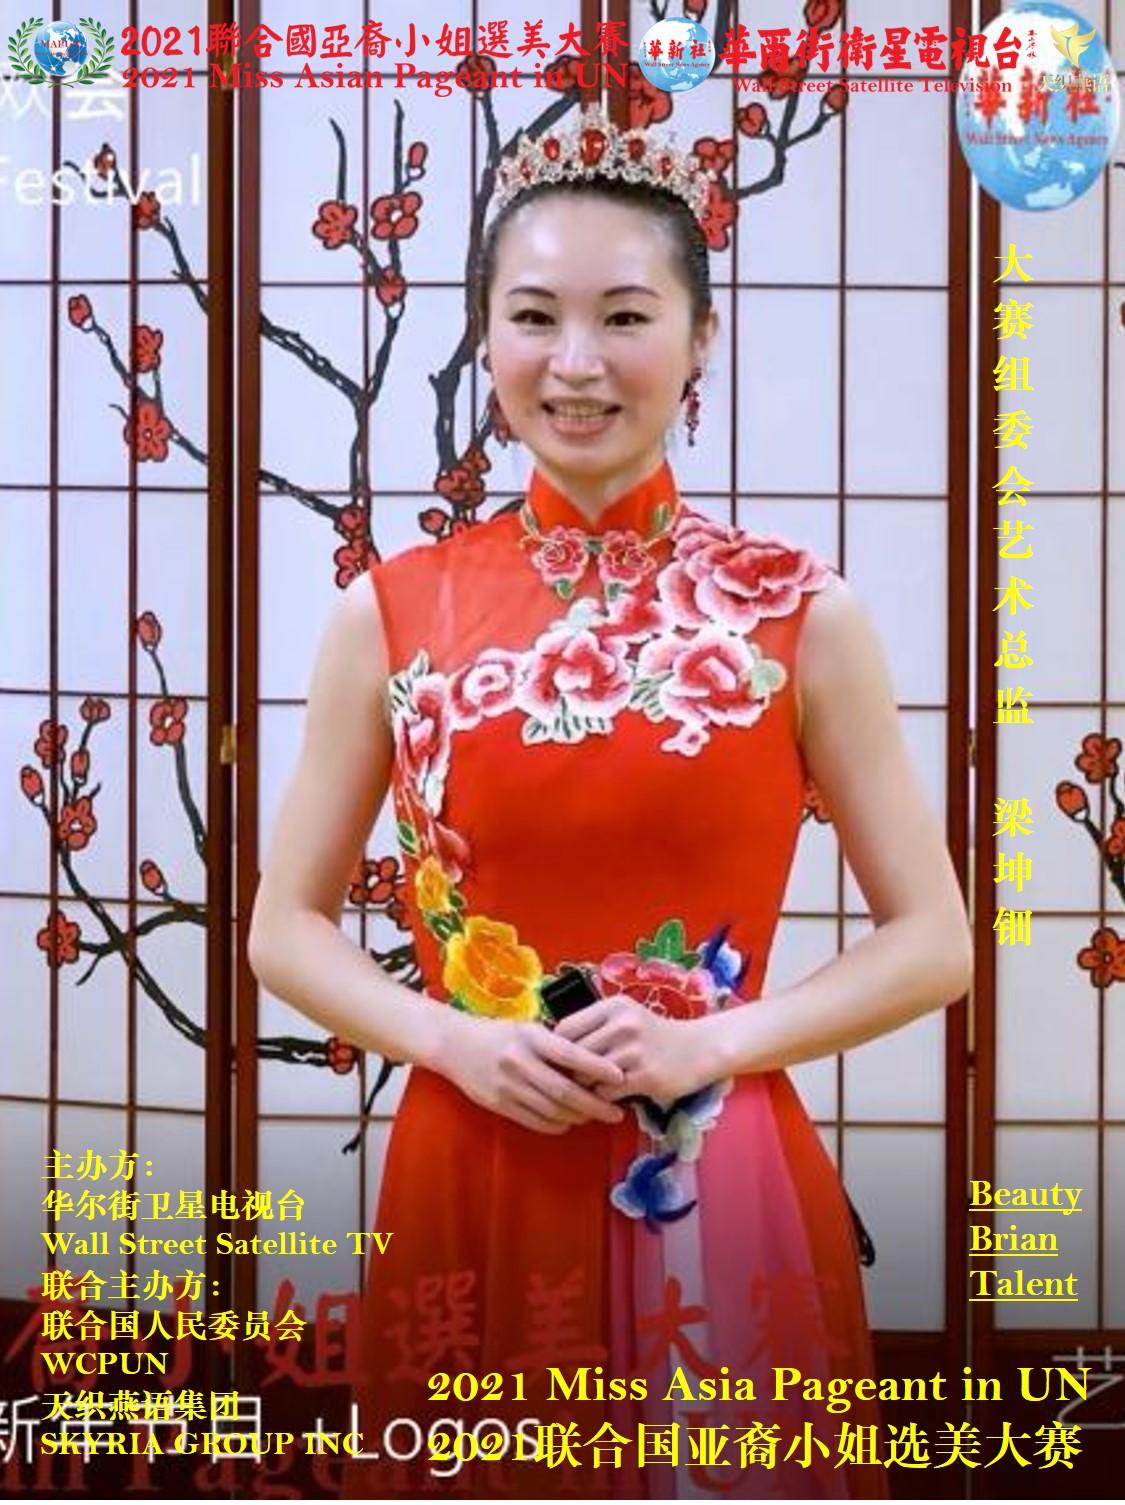 Liang Kuntian Photo 02